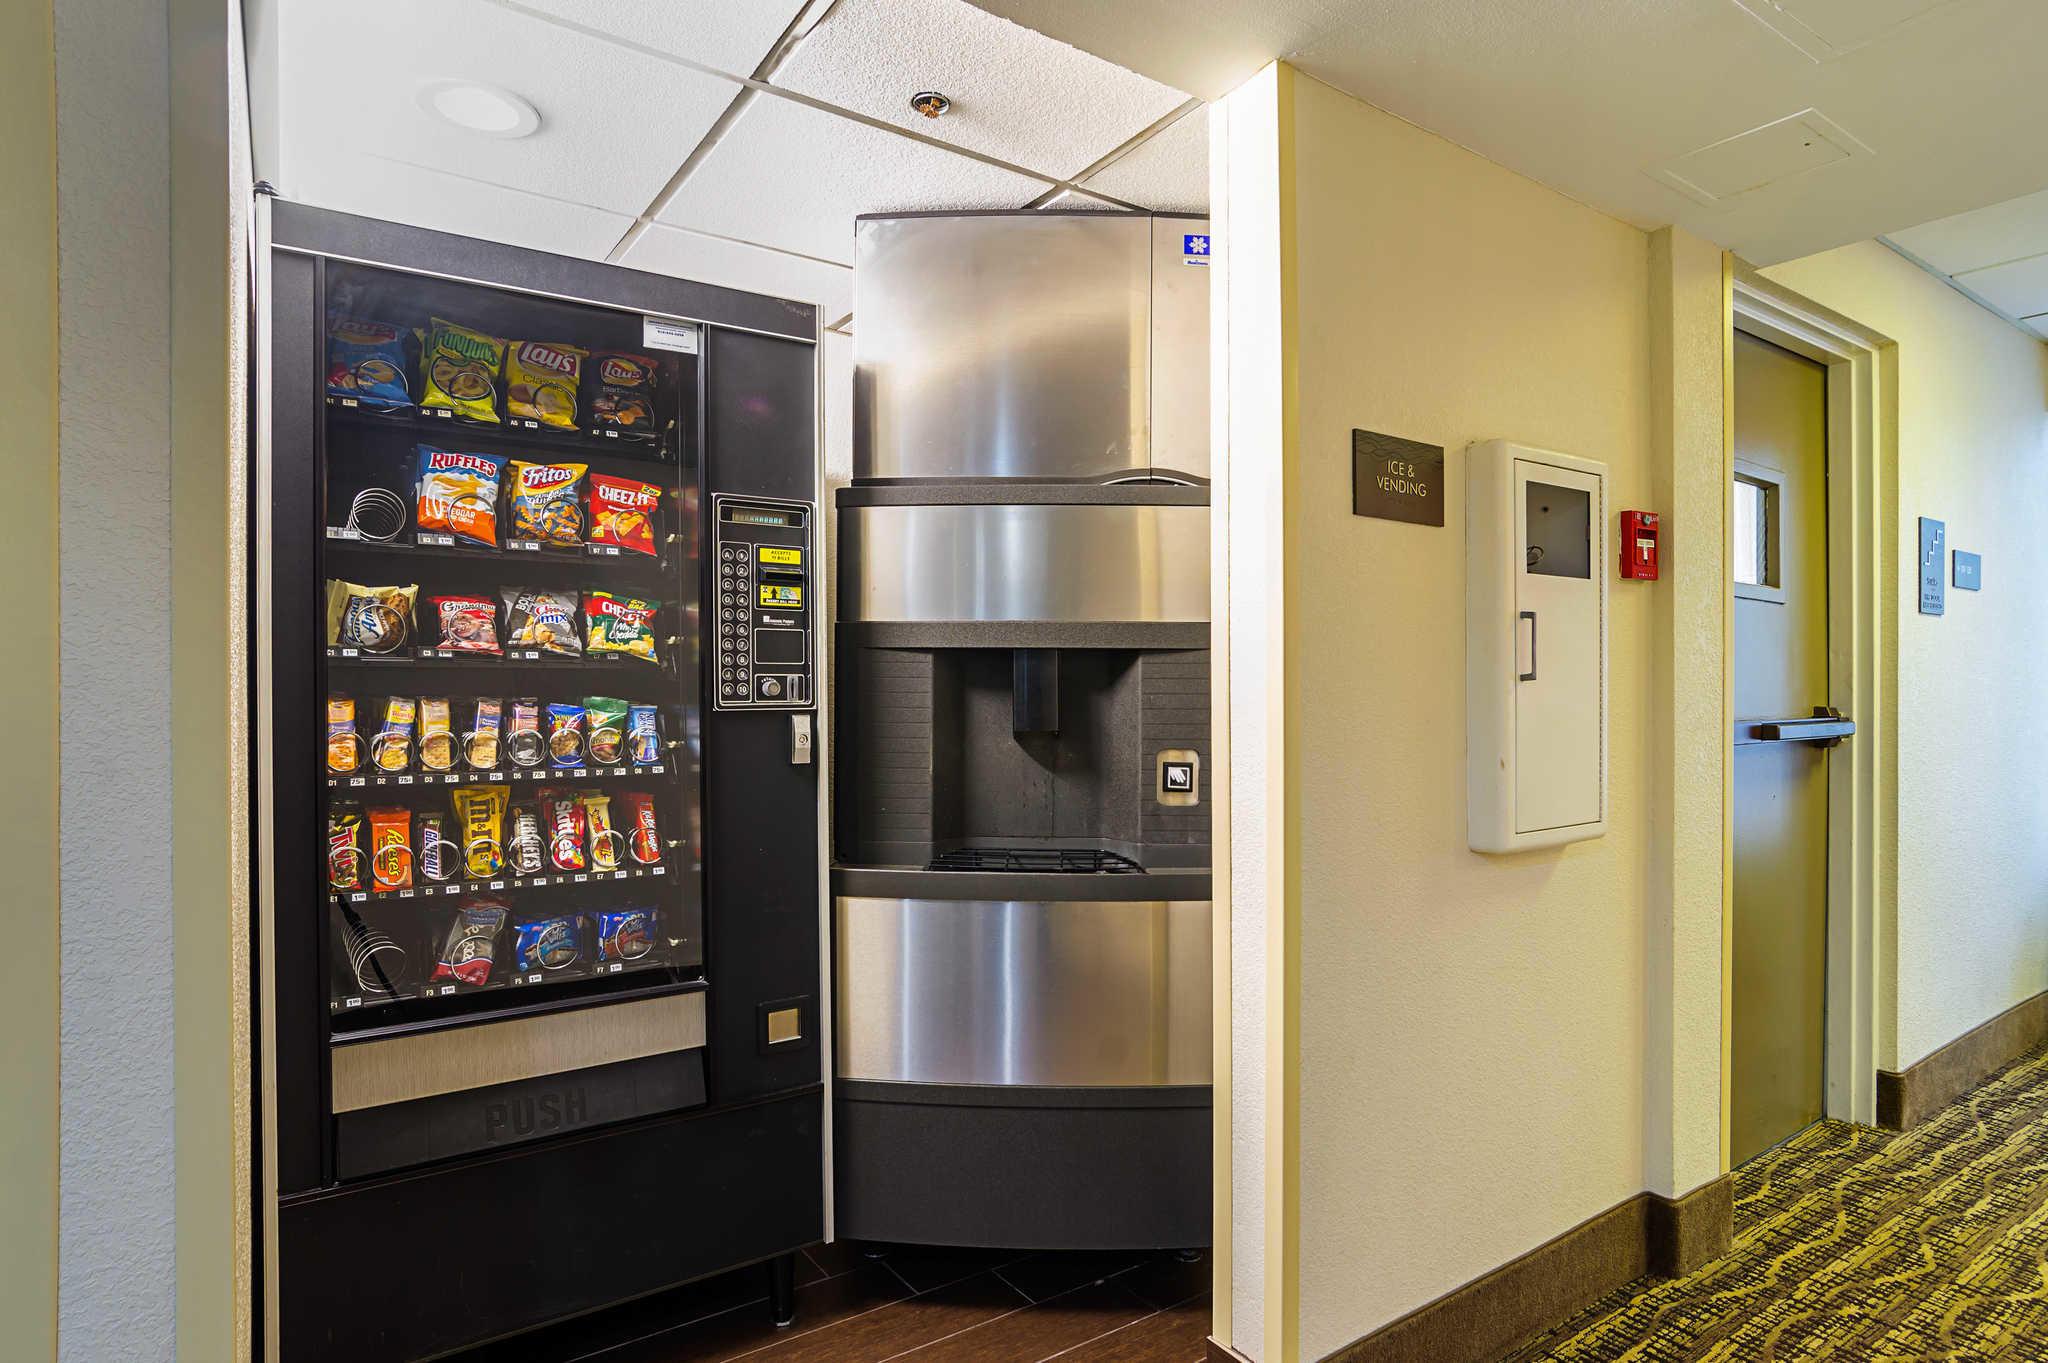 Comfort Inn & Suites Duke University-Downtown image 34